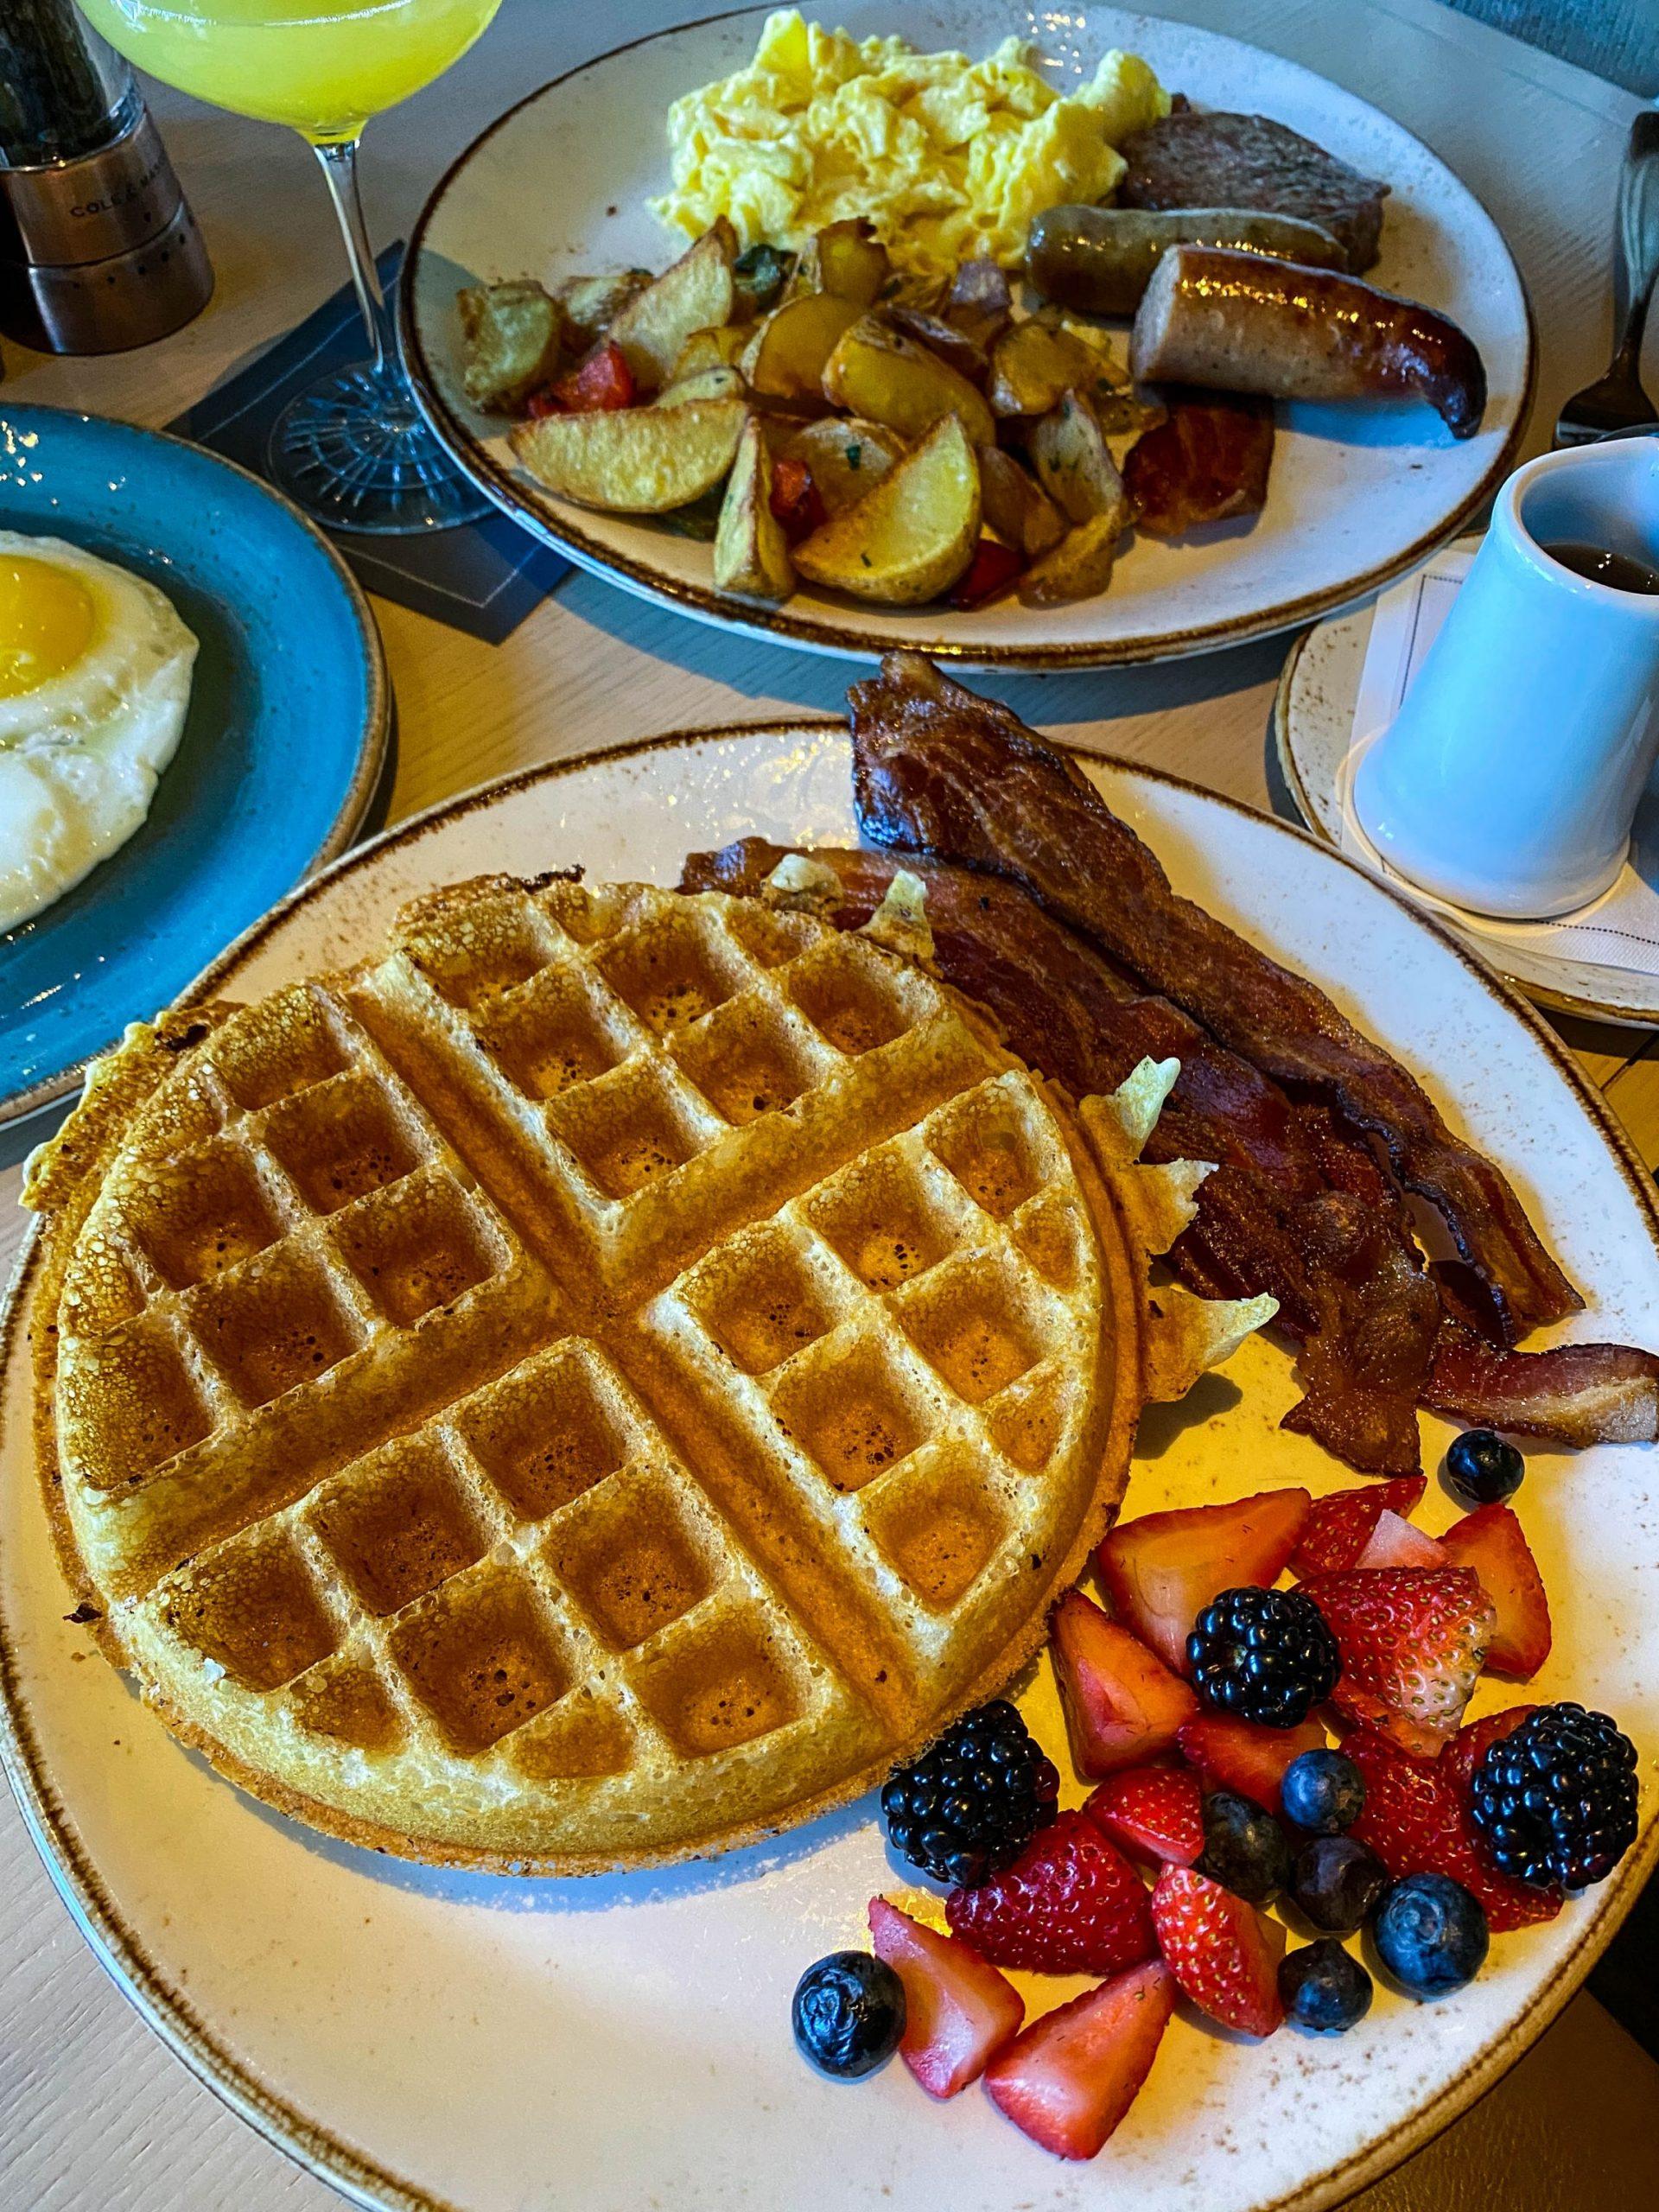 An elegant breakfast at The Bistro Bar at Edgewood Tahoe